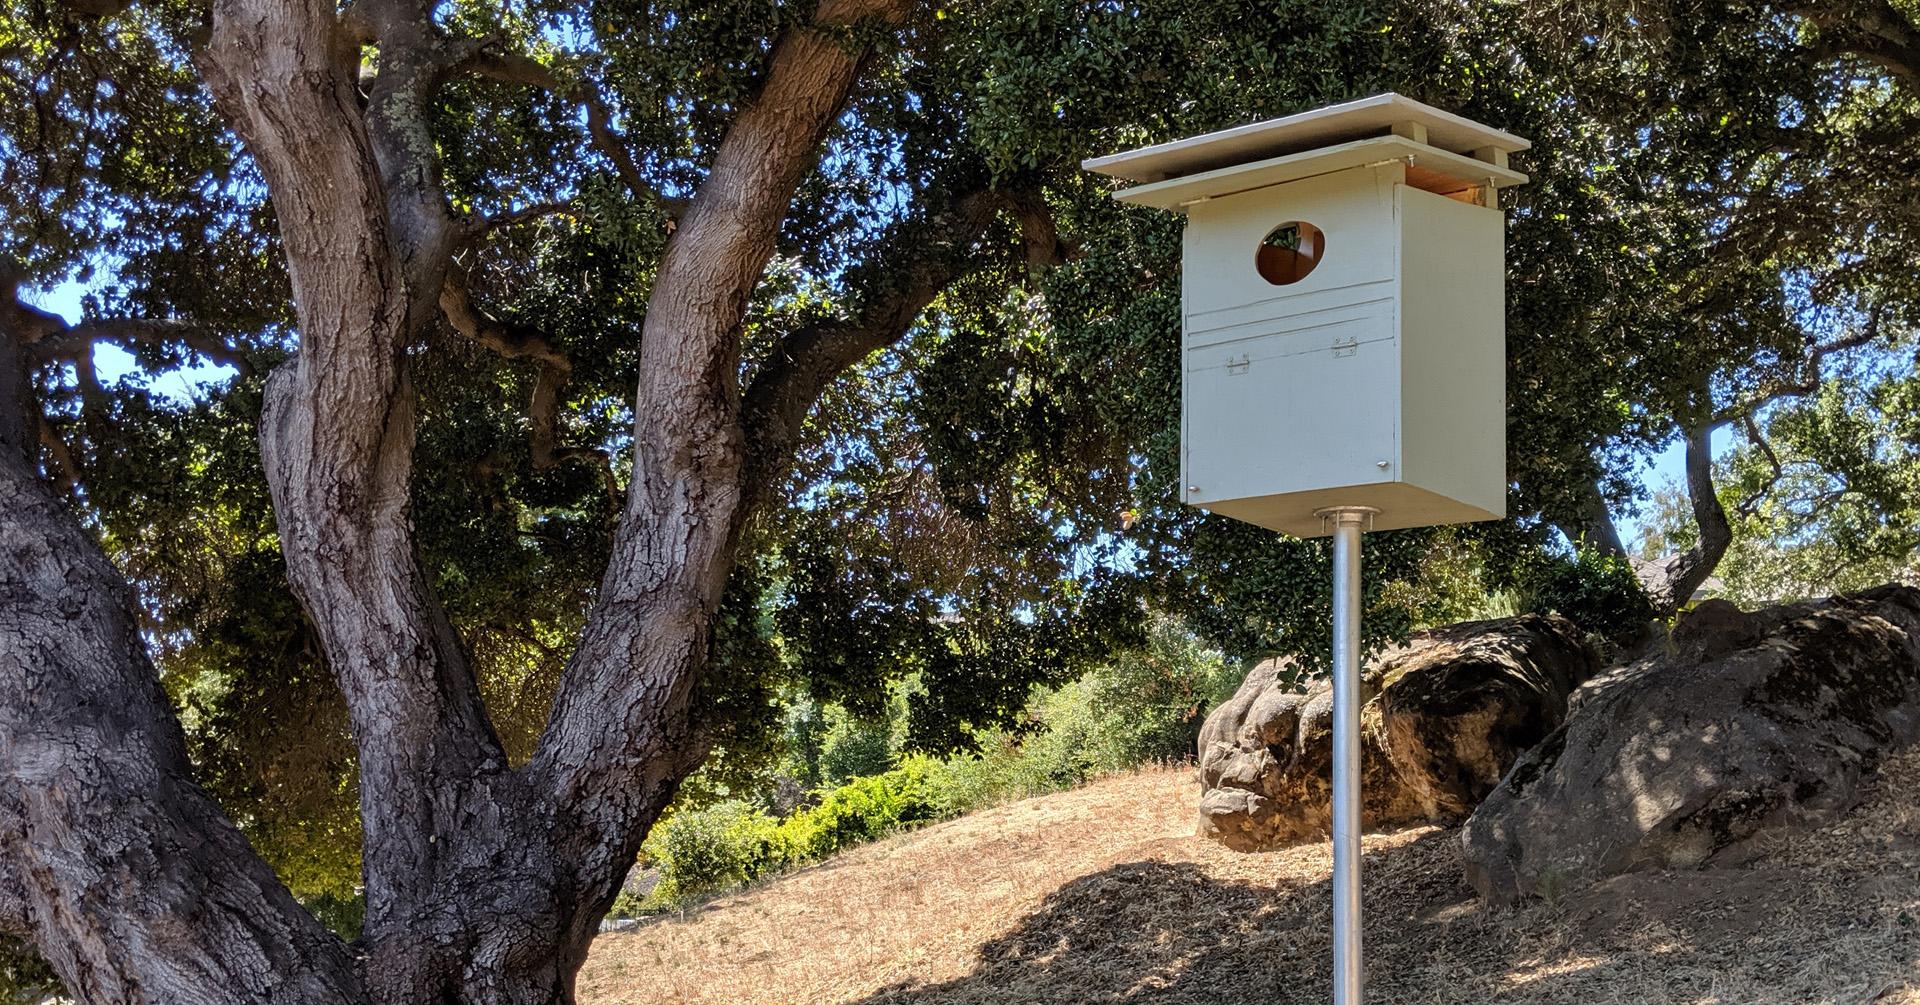 barn-owl-boxes-1920x1005.jpg